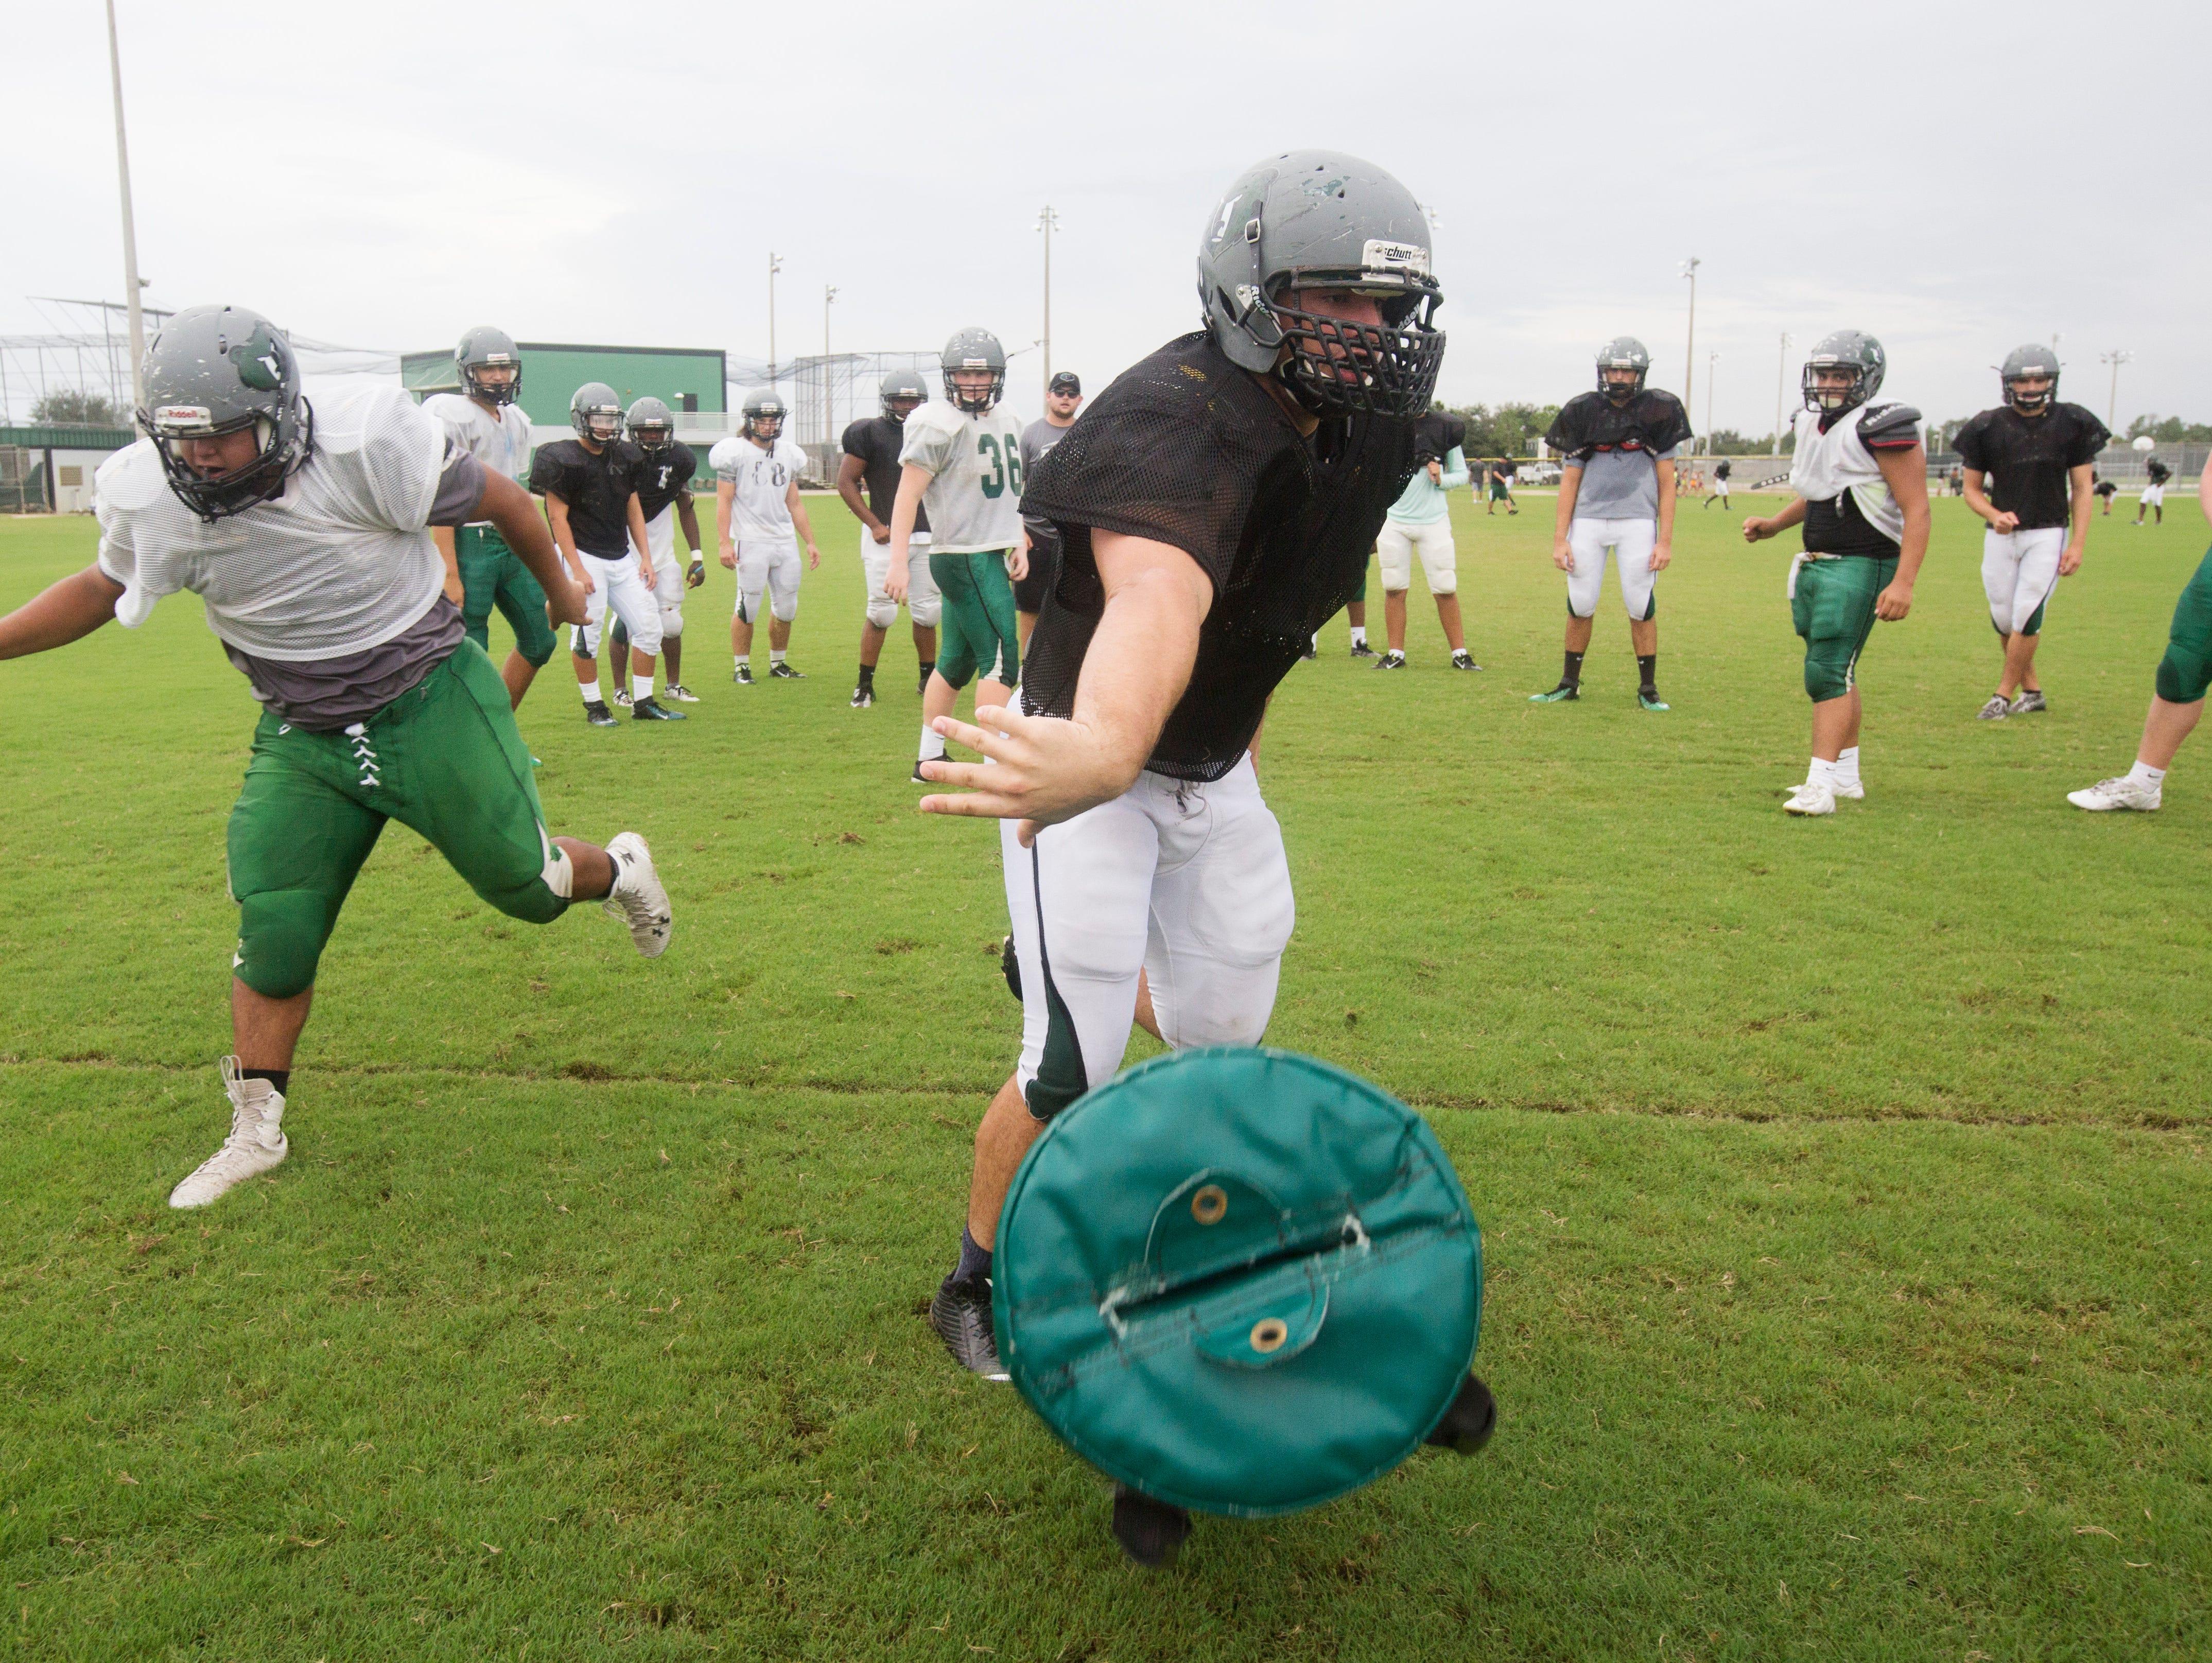 Plmetto Ridge High School defensive lineman Joe Chmielowsk runs drills during practice Tuesday.